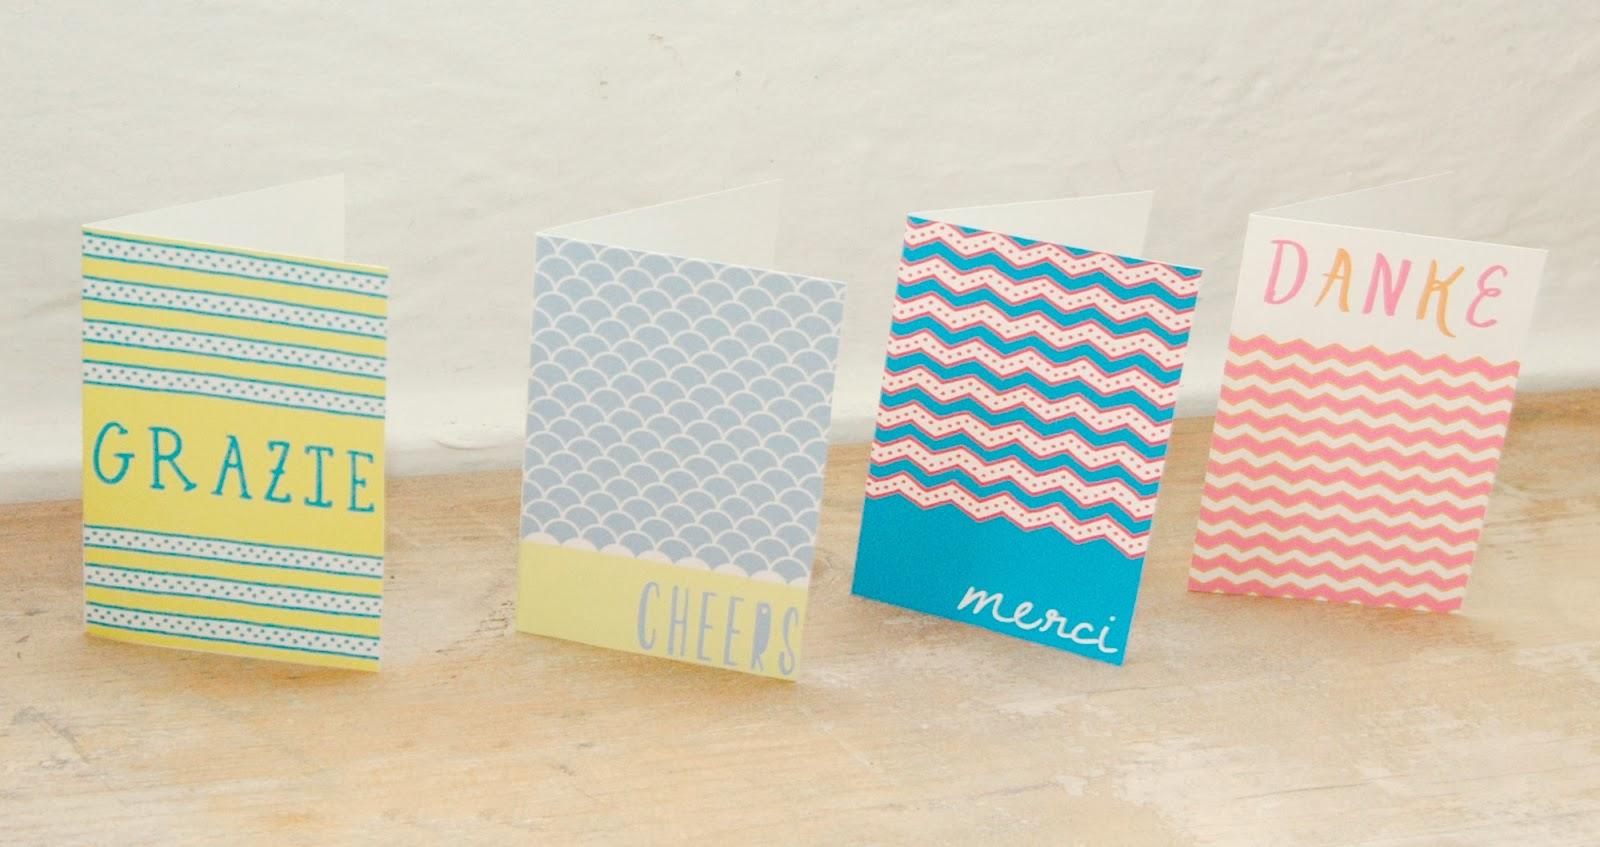 #free #printable #cards #thankyou #thankyou #fold #print #card #design #handdrawn